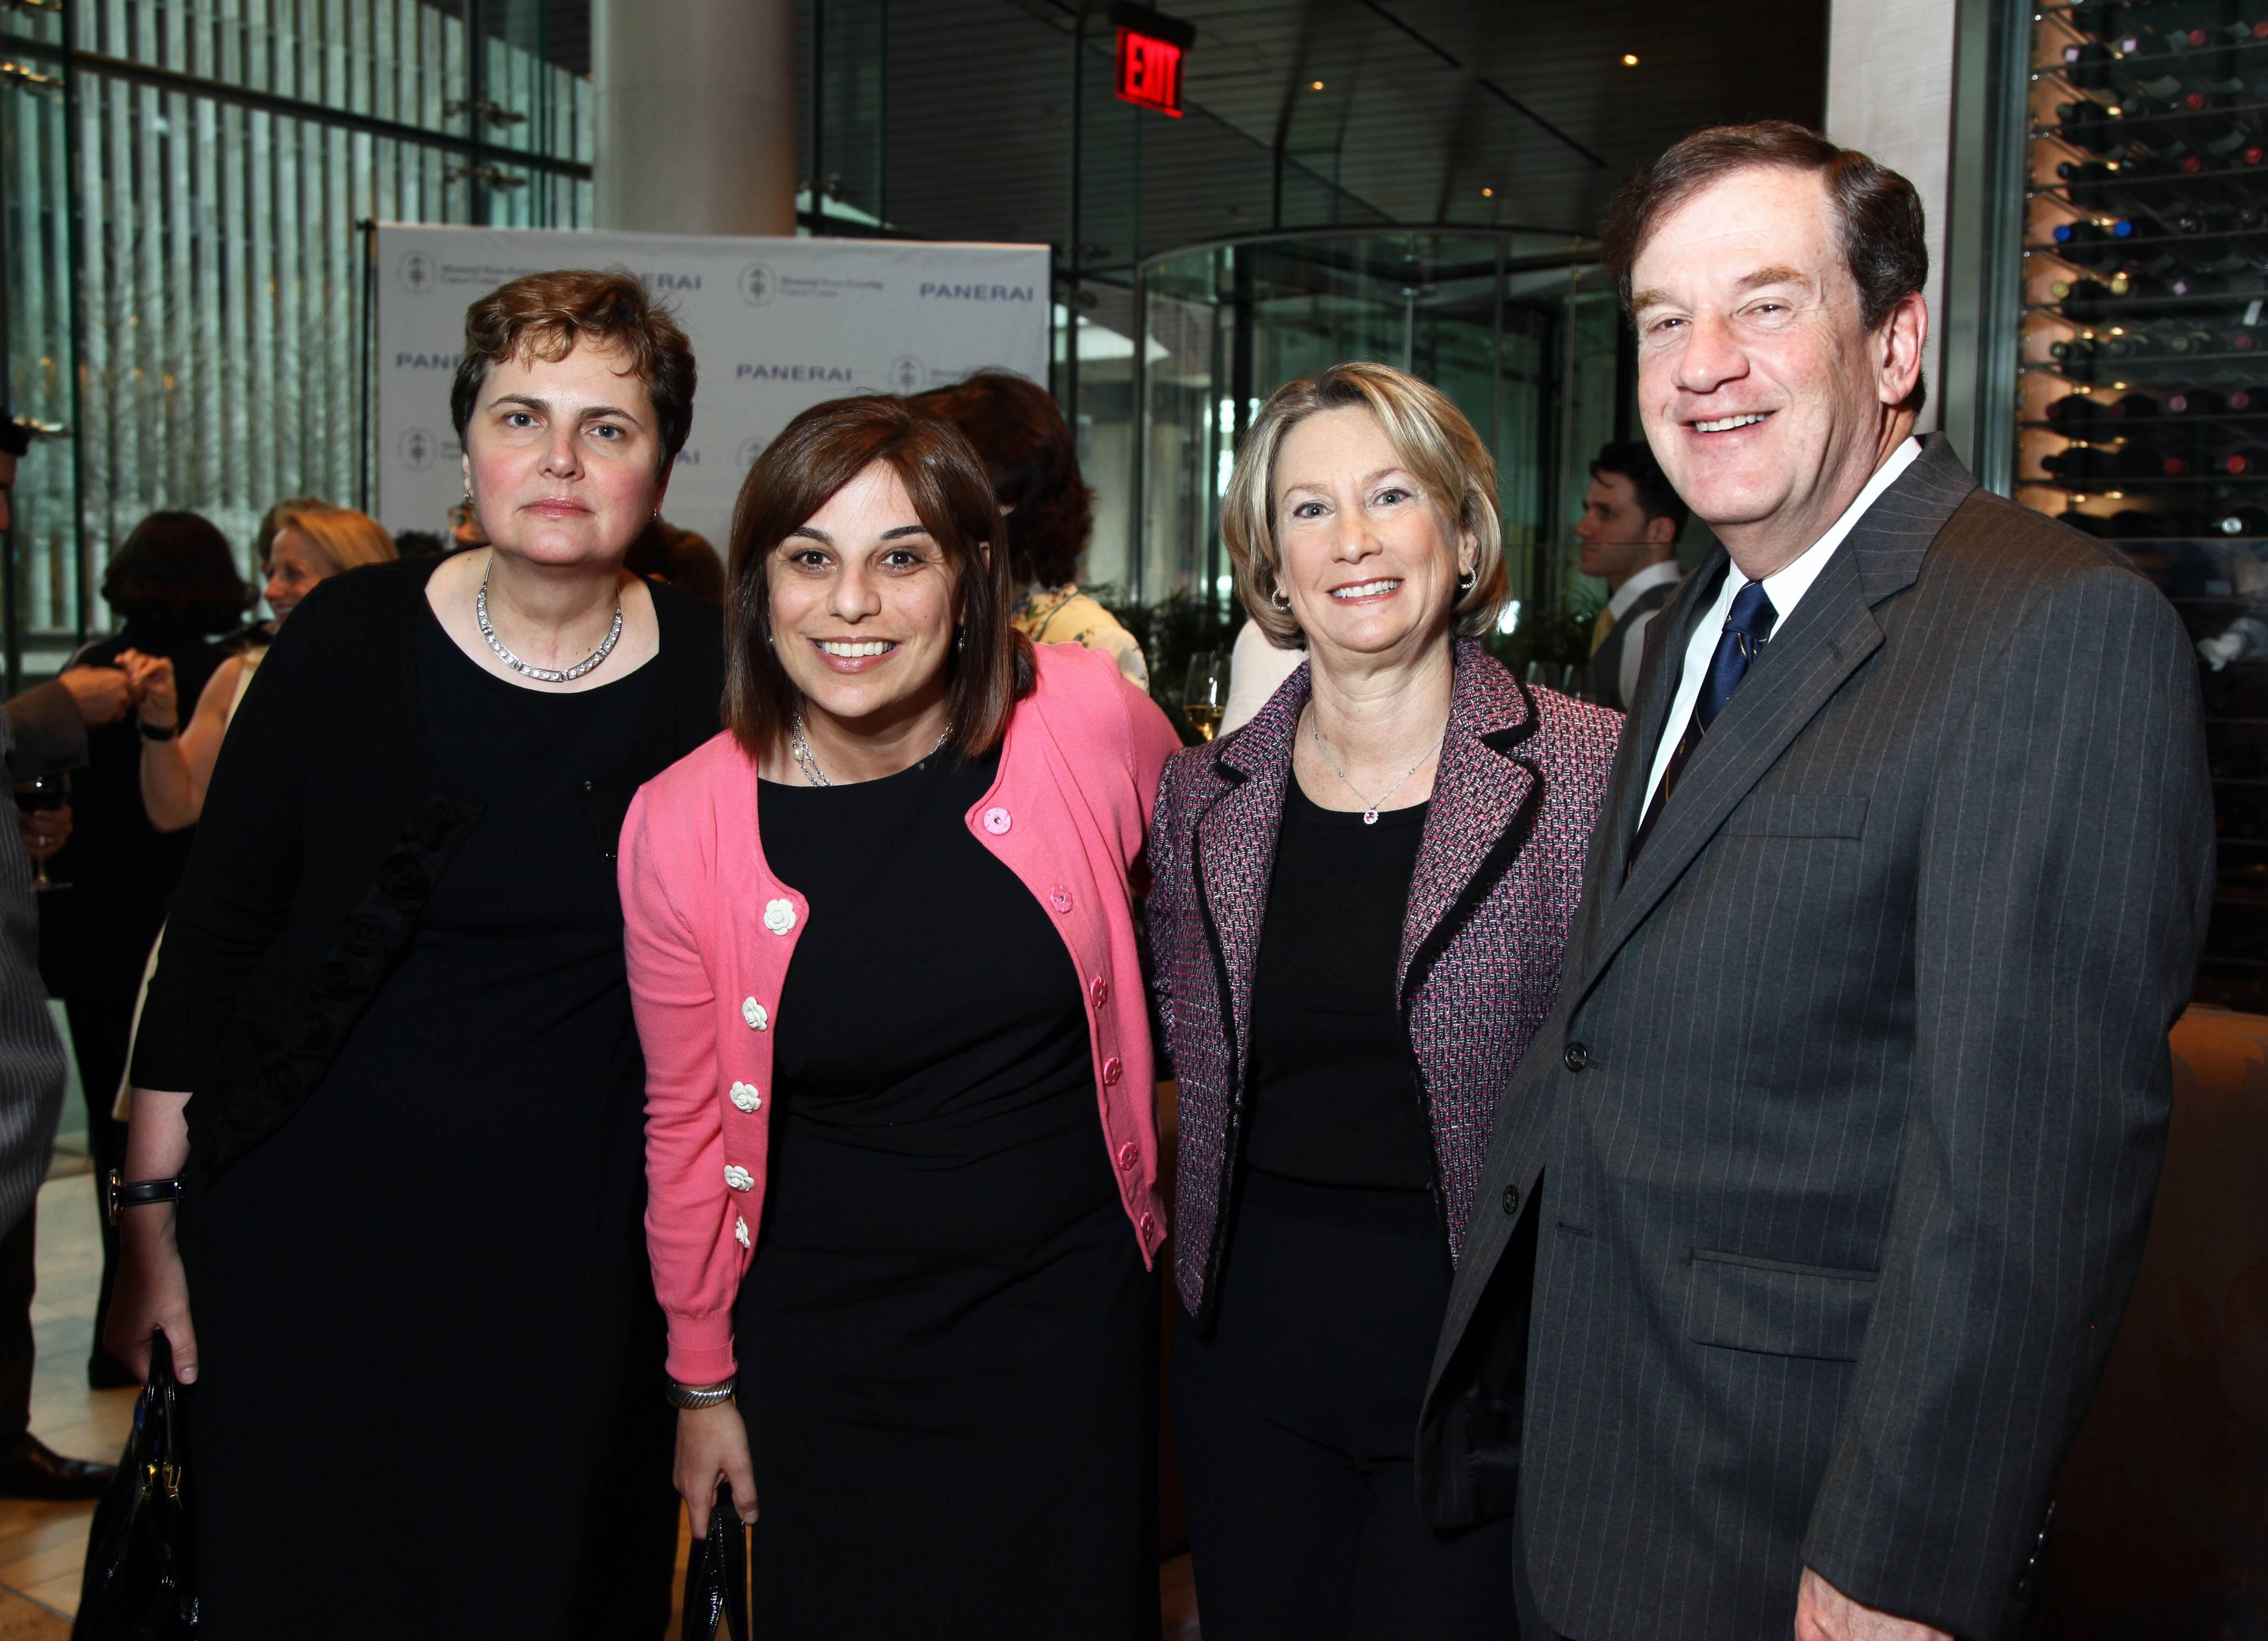 Audrey McInerney, Zeena Abdulahad, Stew Krentzman, Bonnie Krentzman (2)